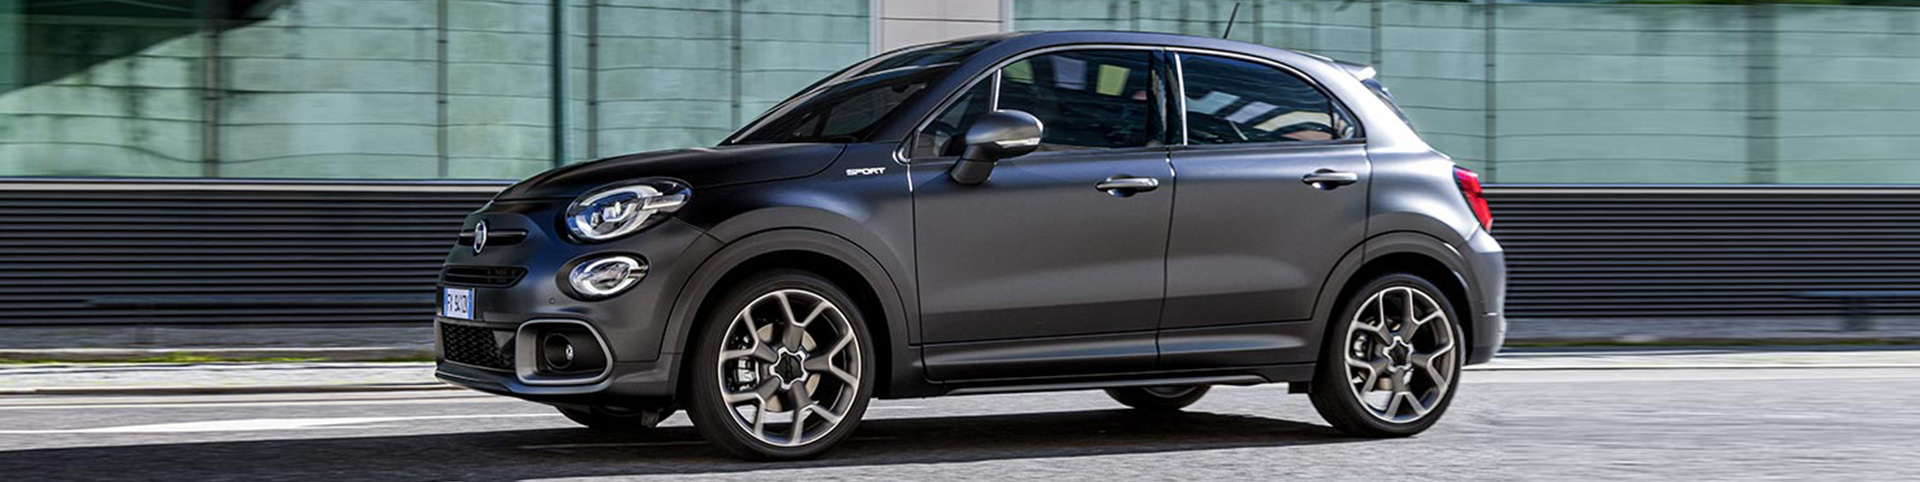 Fiat 500X Autozentren P&A - Preckel